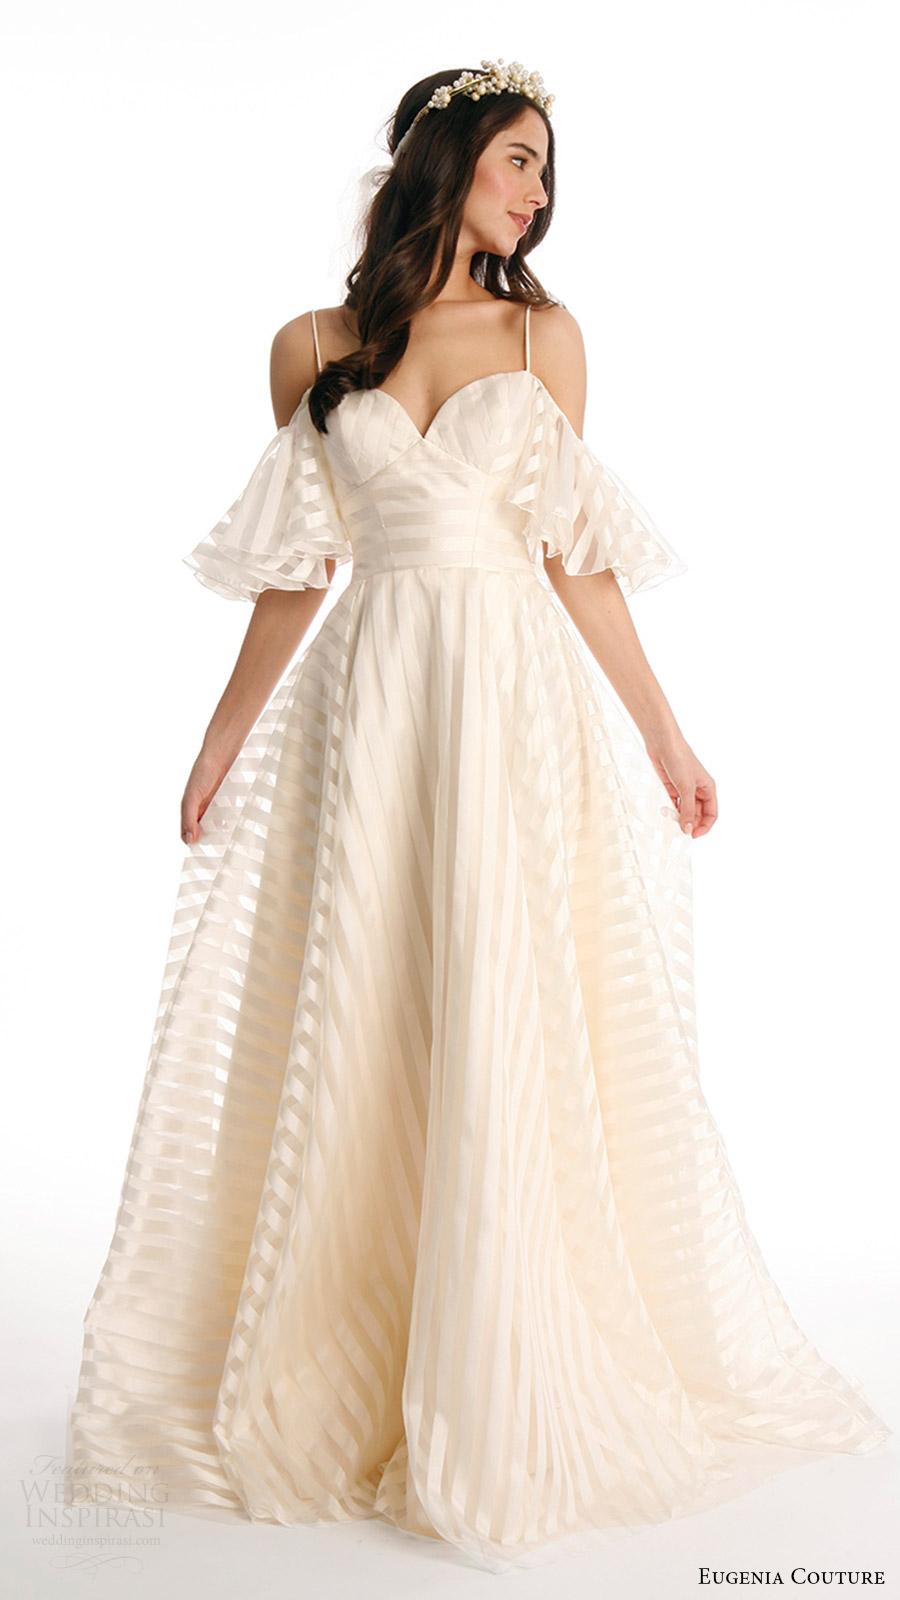 Eugenia Couture Spring 2017 Wedding Dresses — Joy Bridal Collection ...